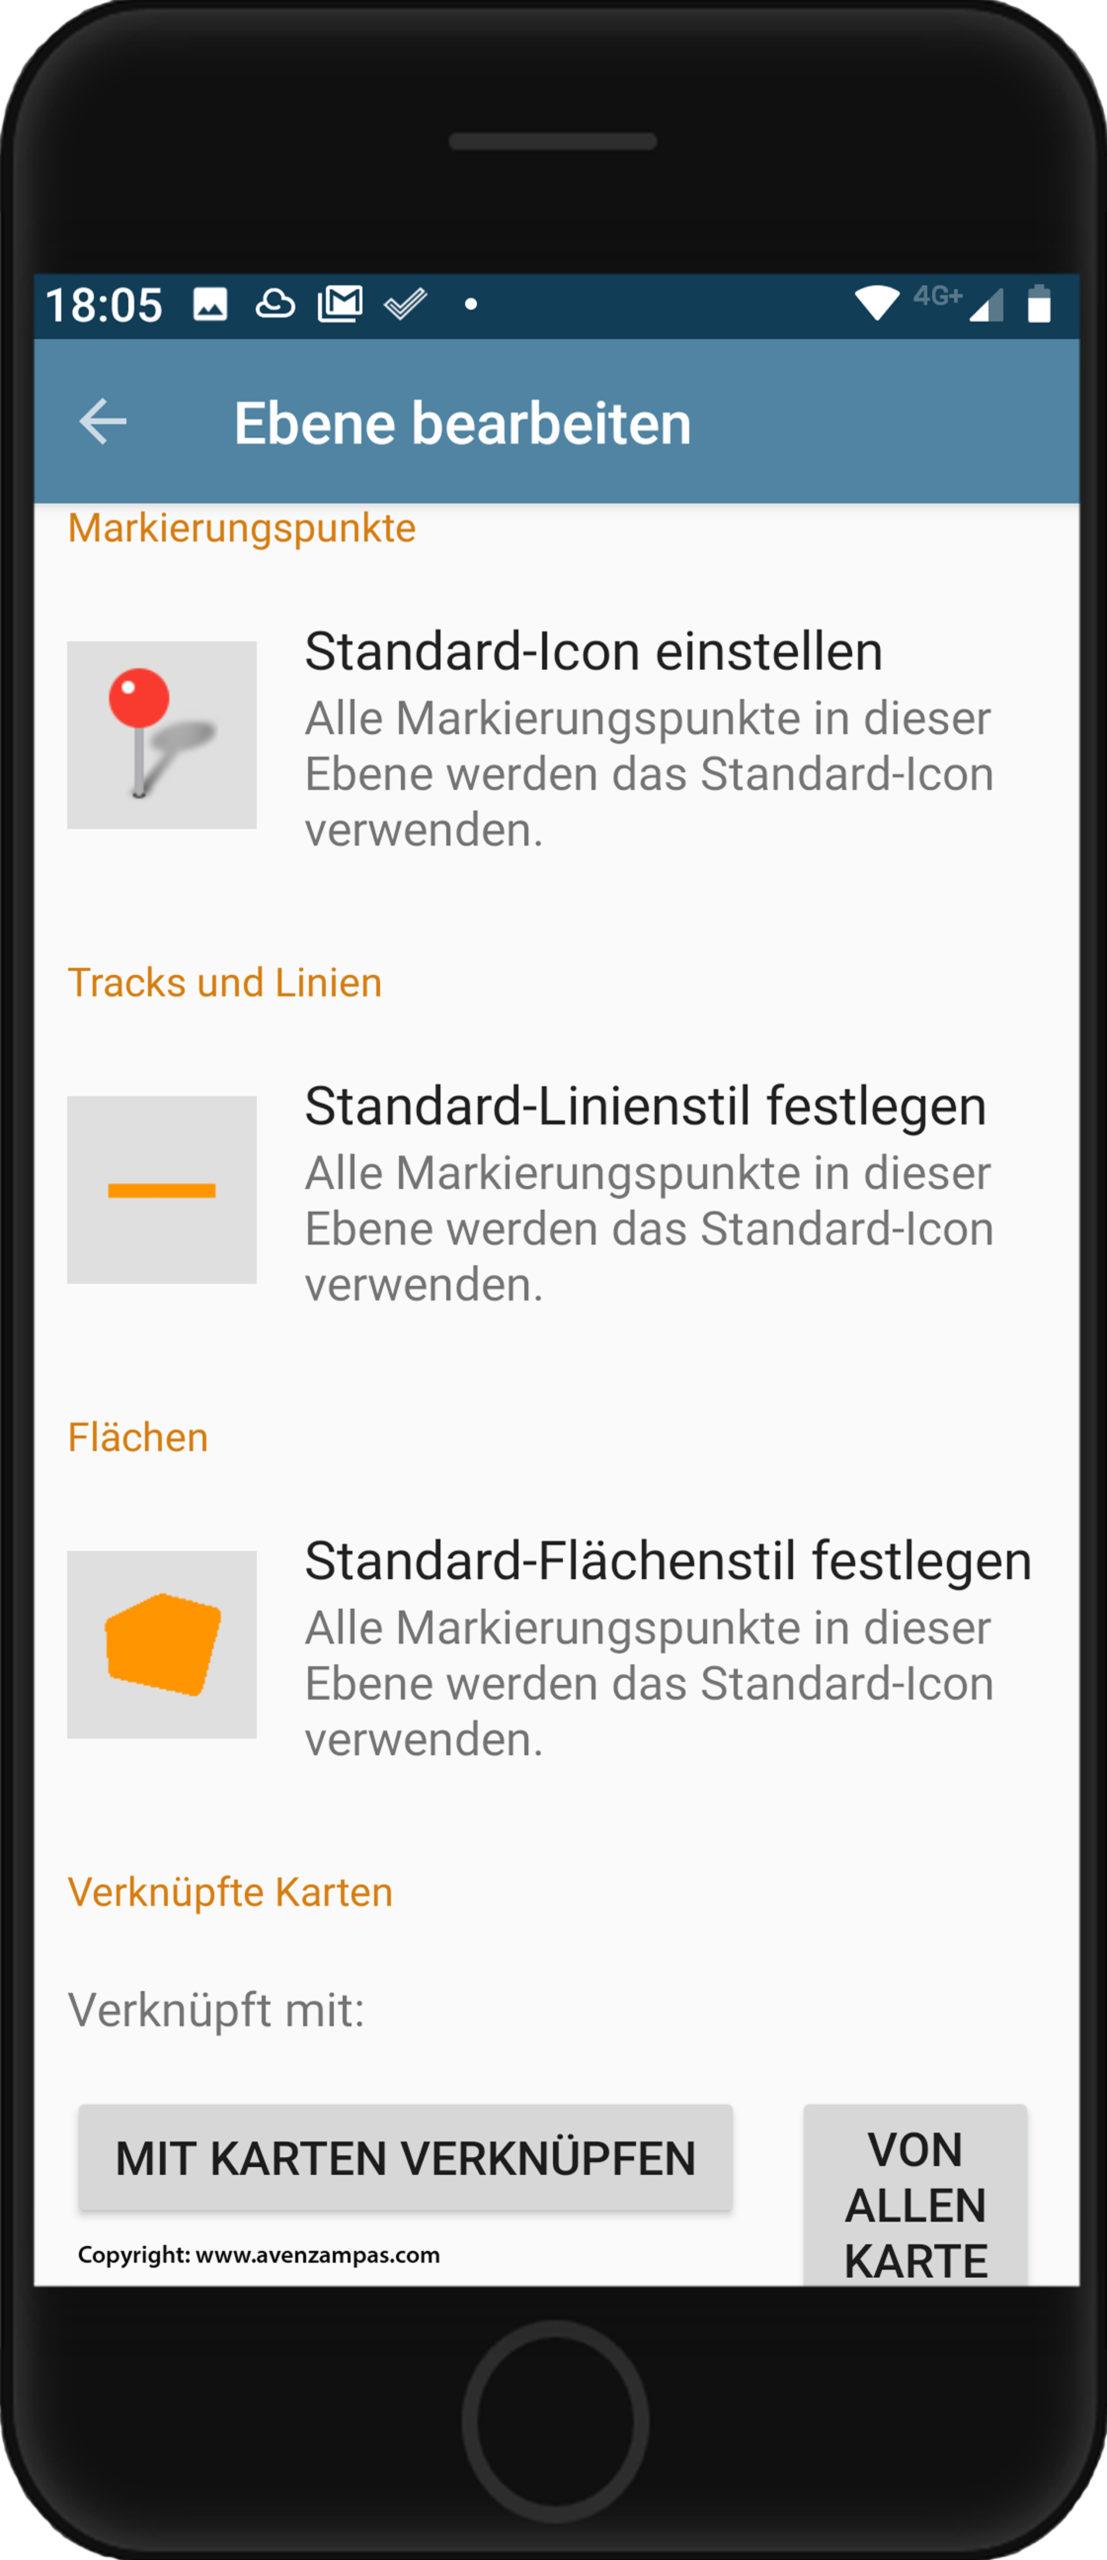 Grundkarte panoMap Smartphone Avenzamaps Ebene Copyright